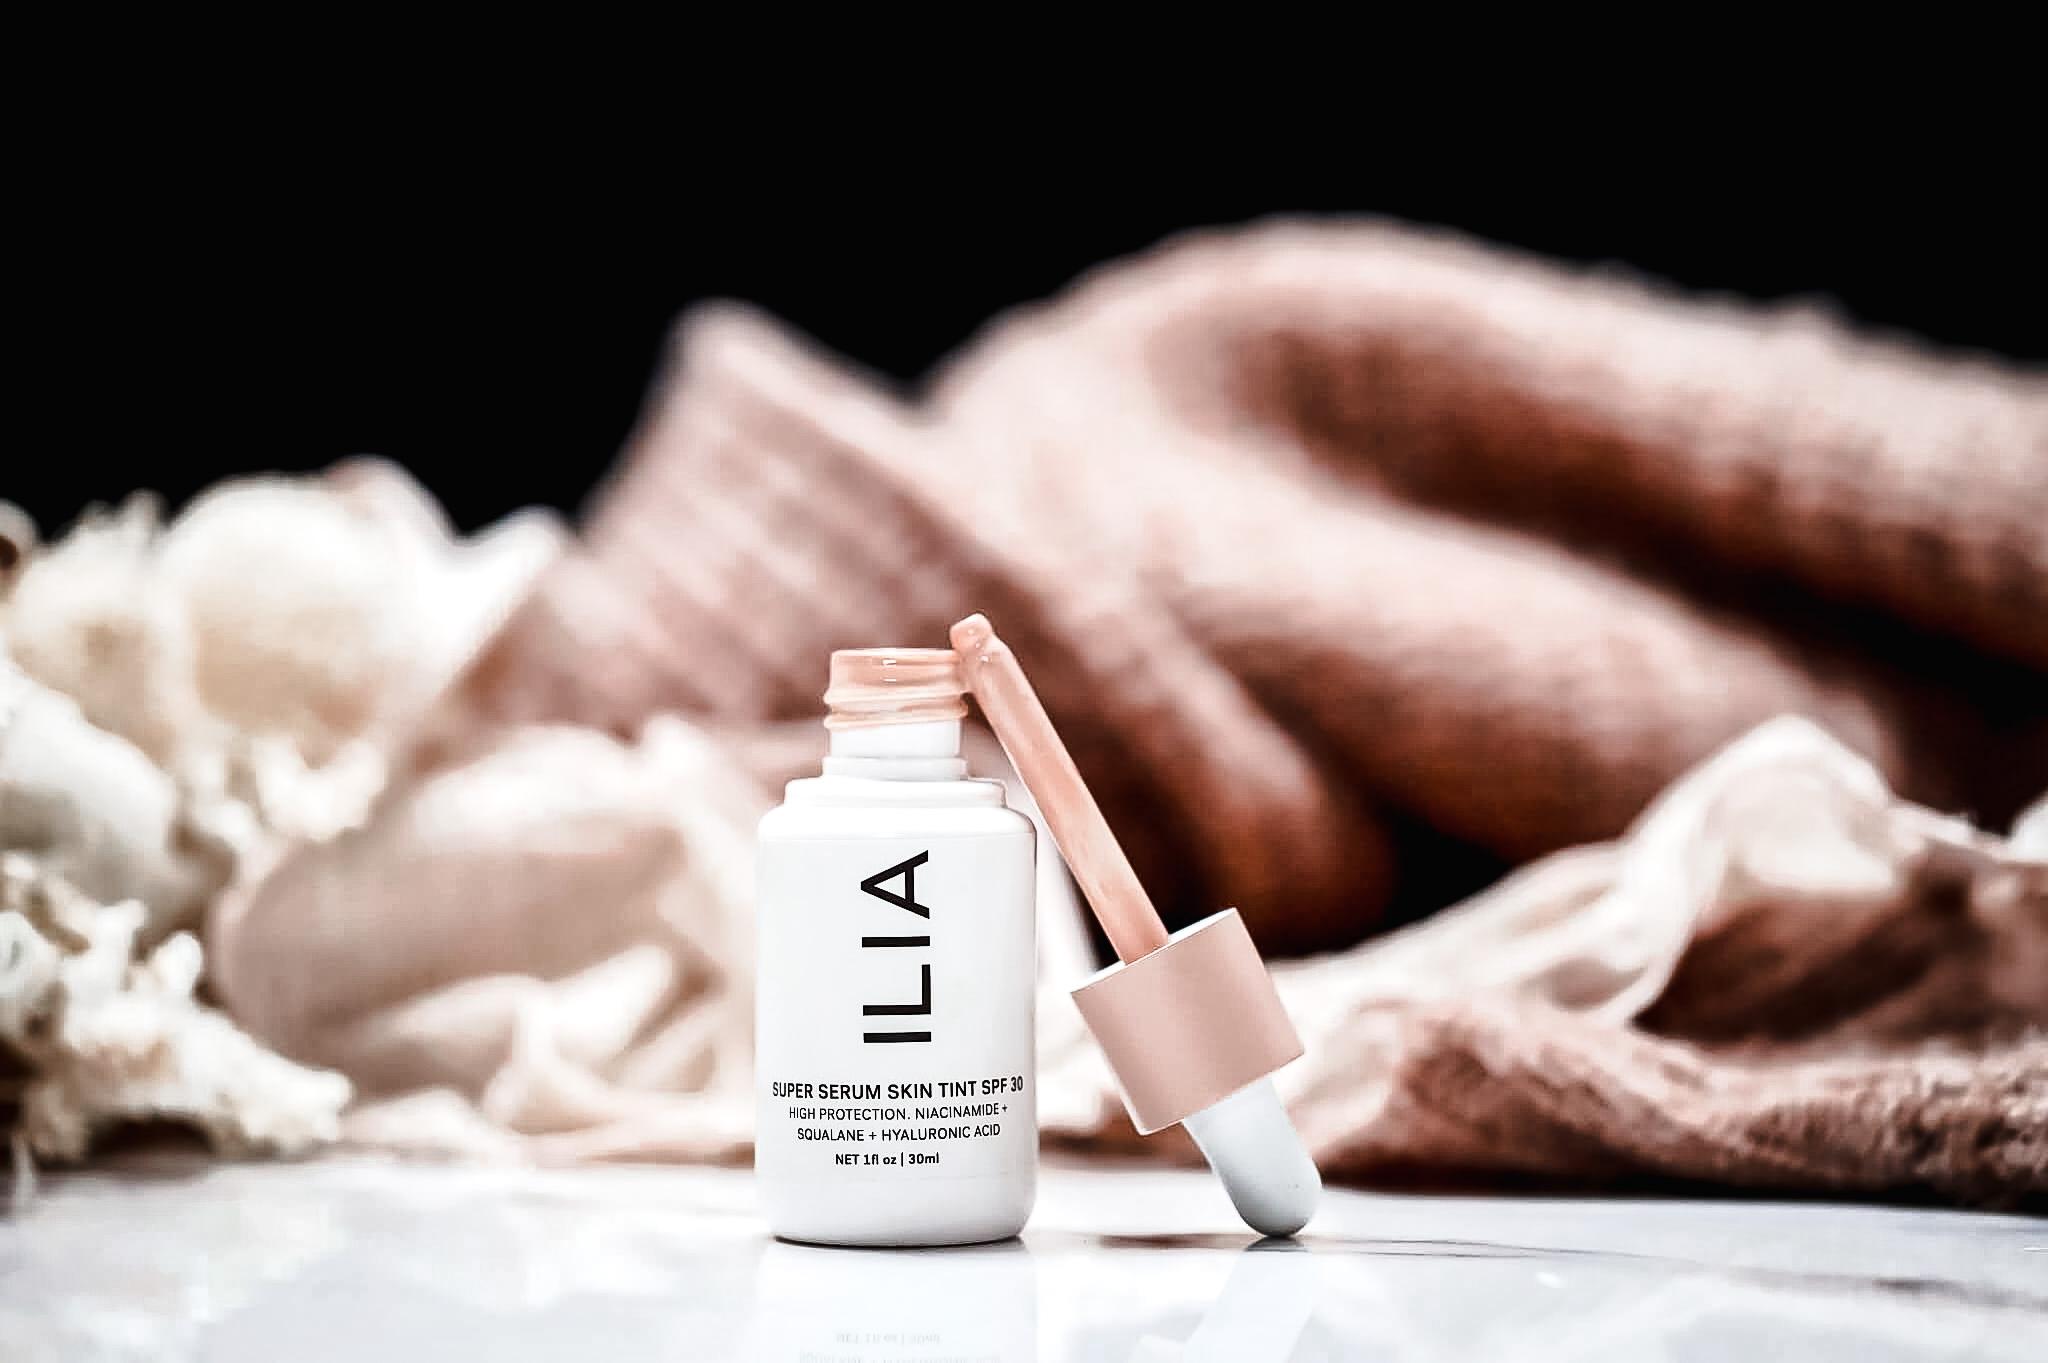 Ilia Super Sérum Skin Tint fond de teint